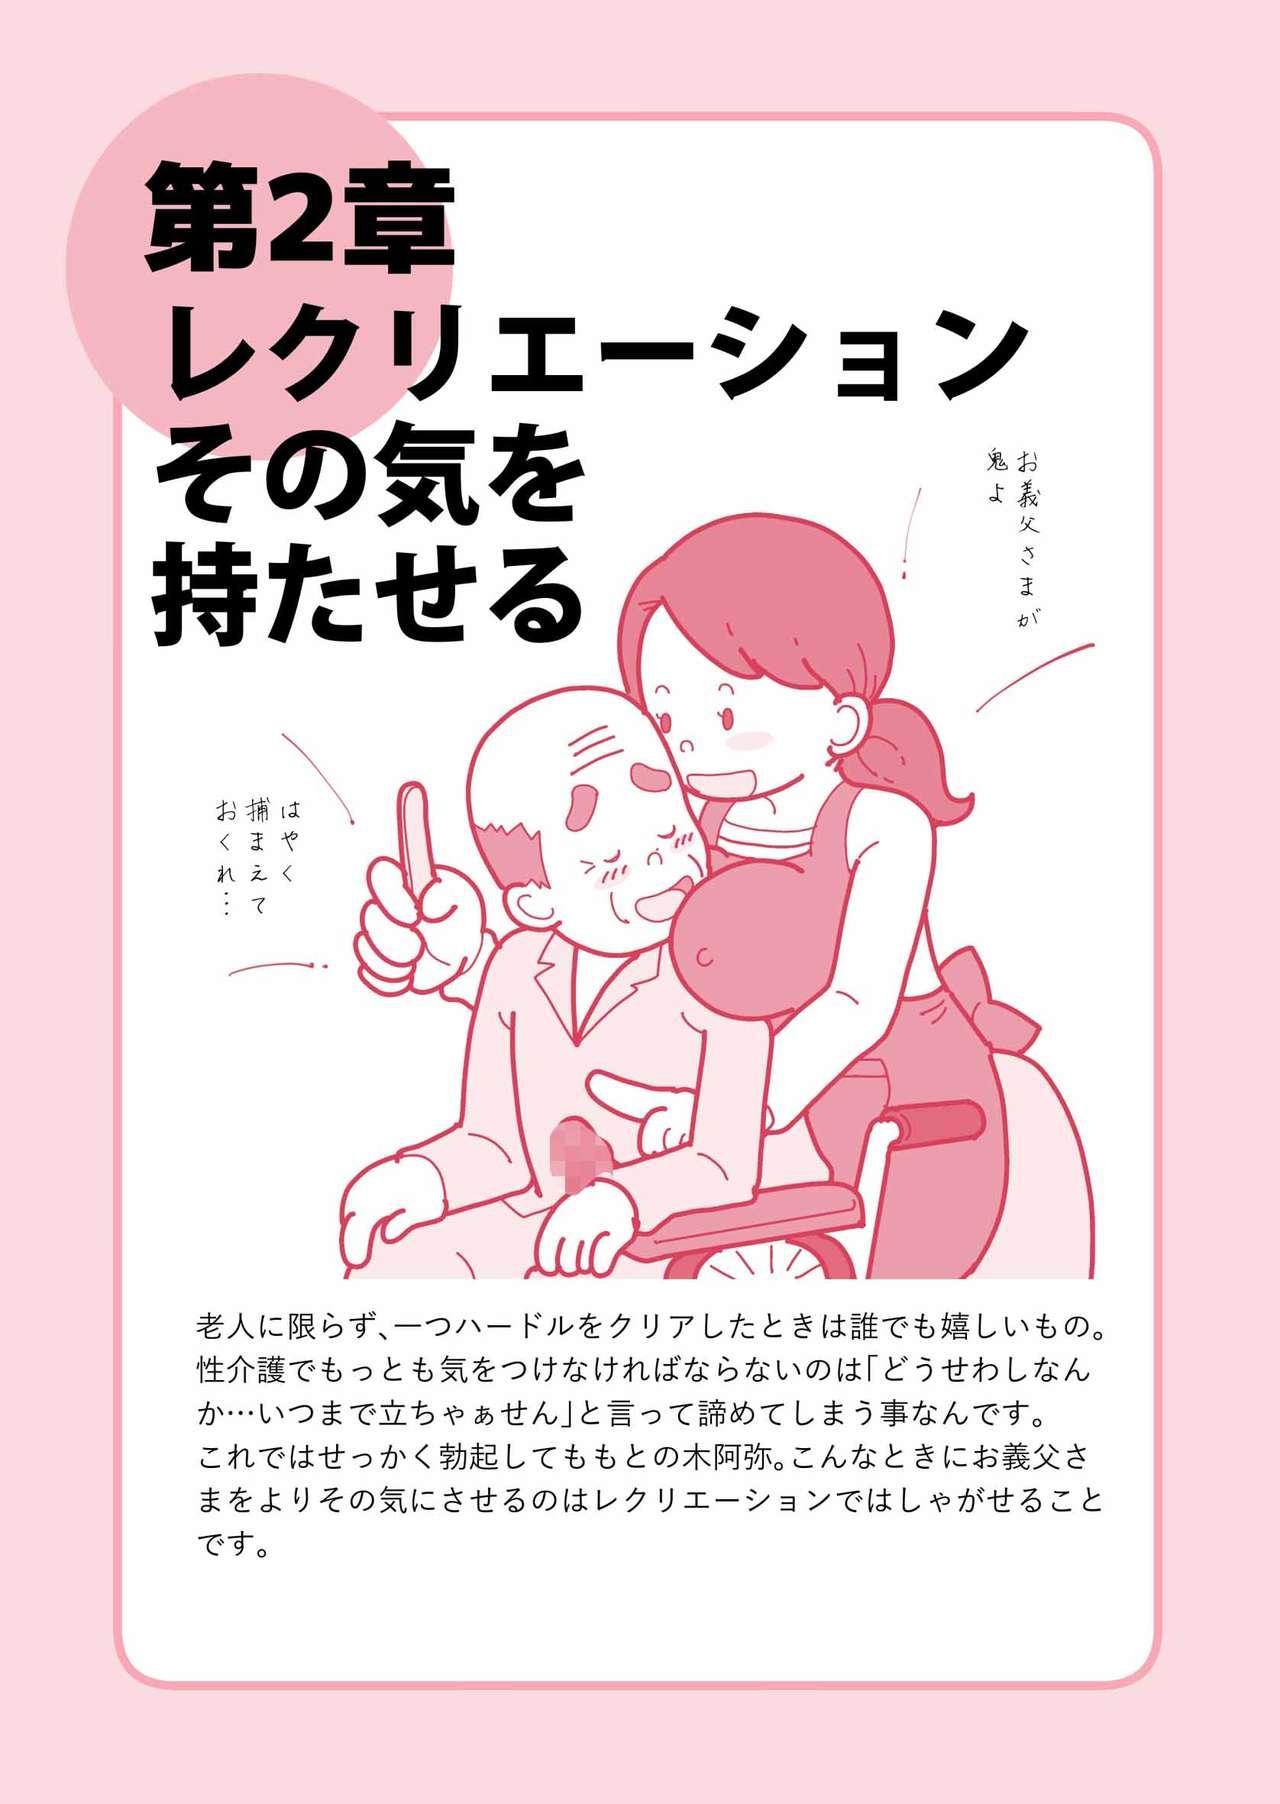 Isogasii Okaasan No Tamuno Sasa Rouzin Seikaigo | Guide for Elderly Sex Health Care to Busy Mom 20